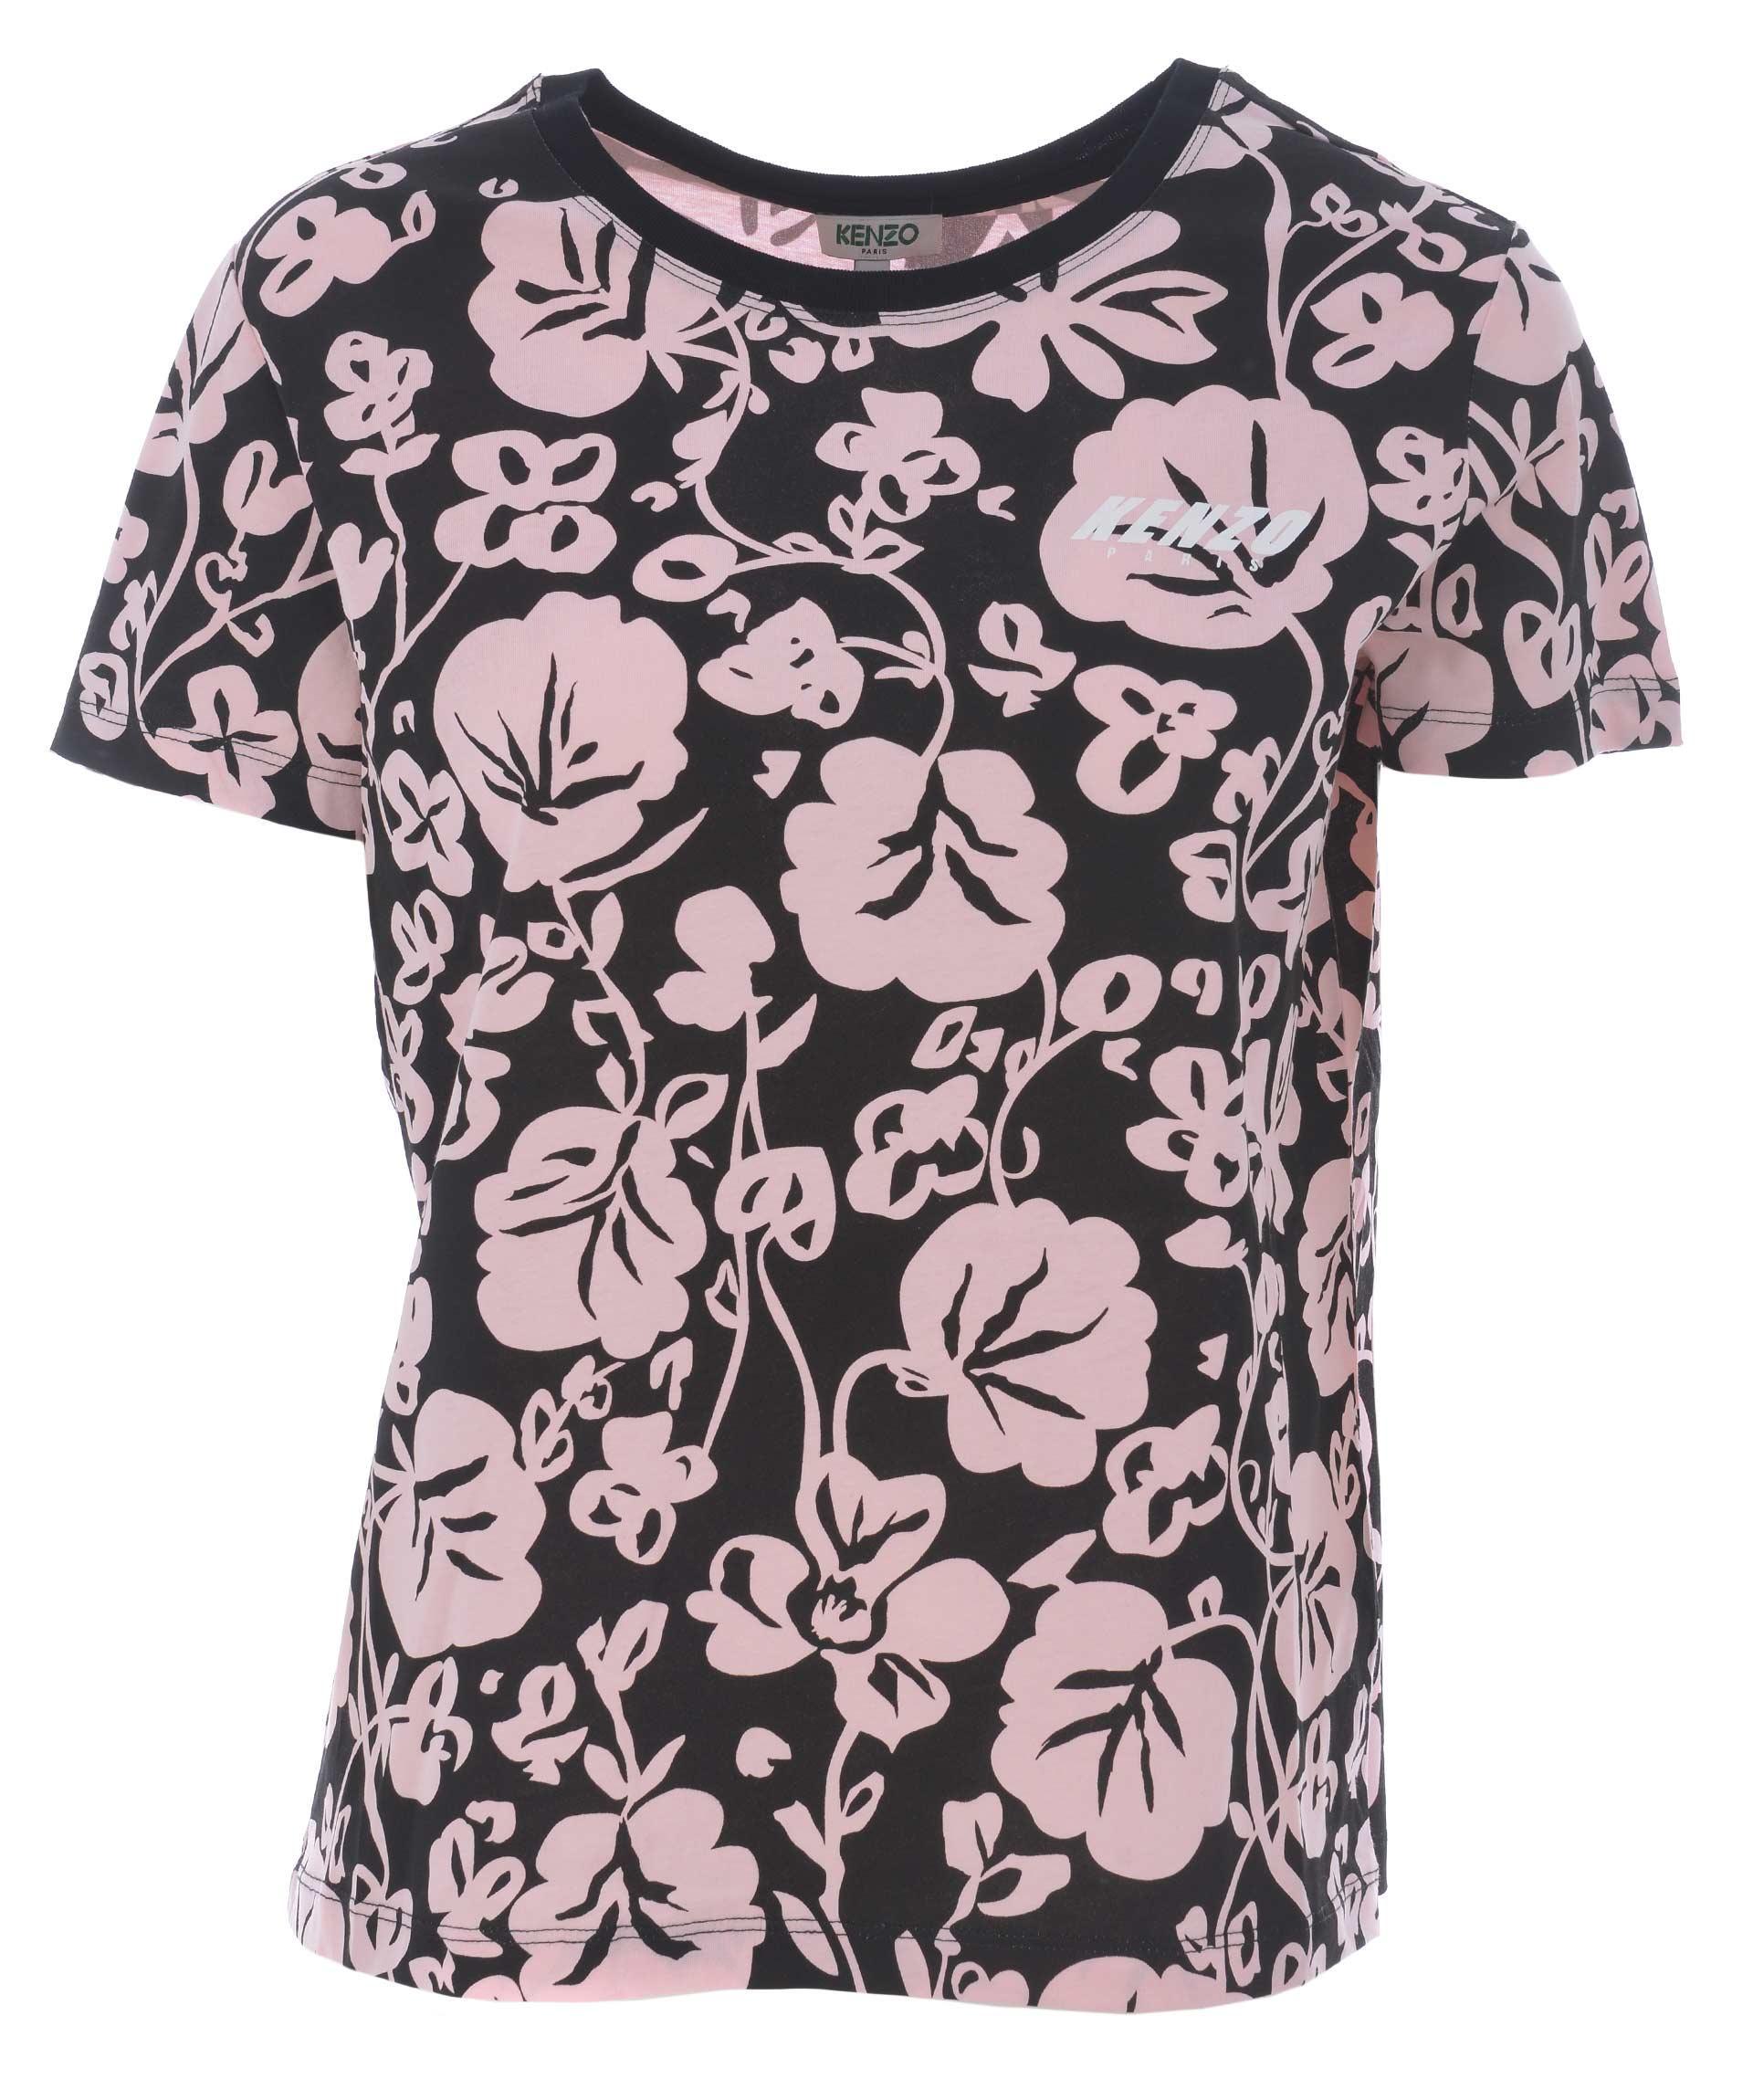 Kenzo Floral Leaf Print T-Shirt In Nero/Rosa